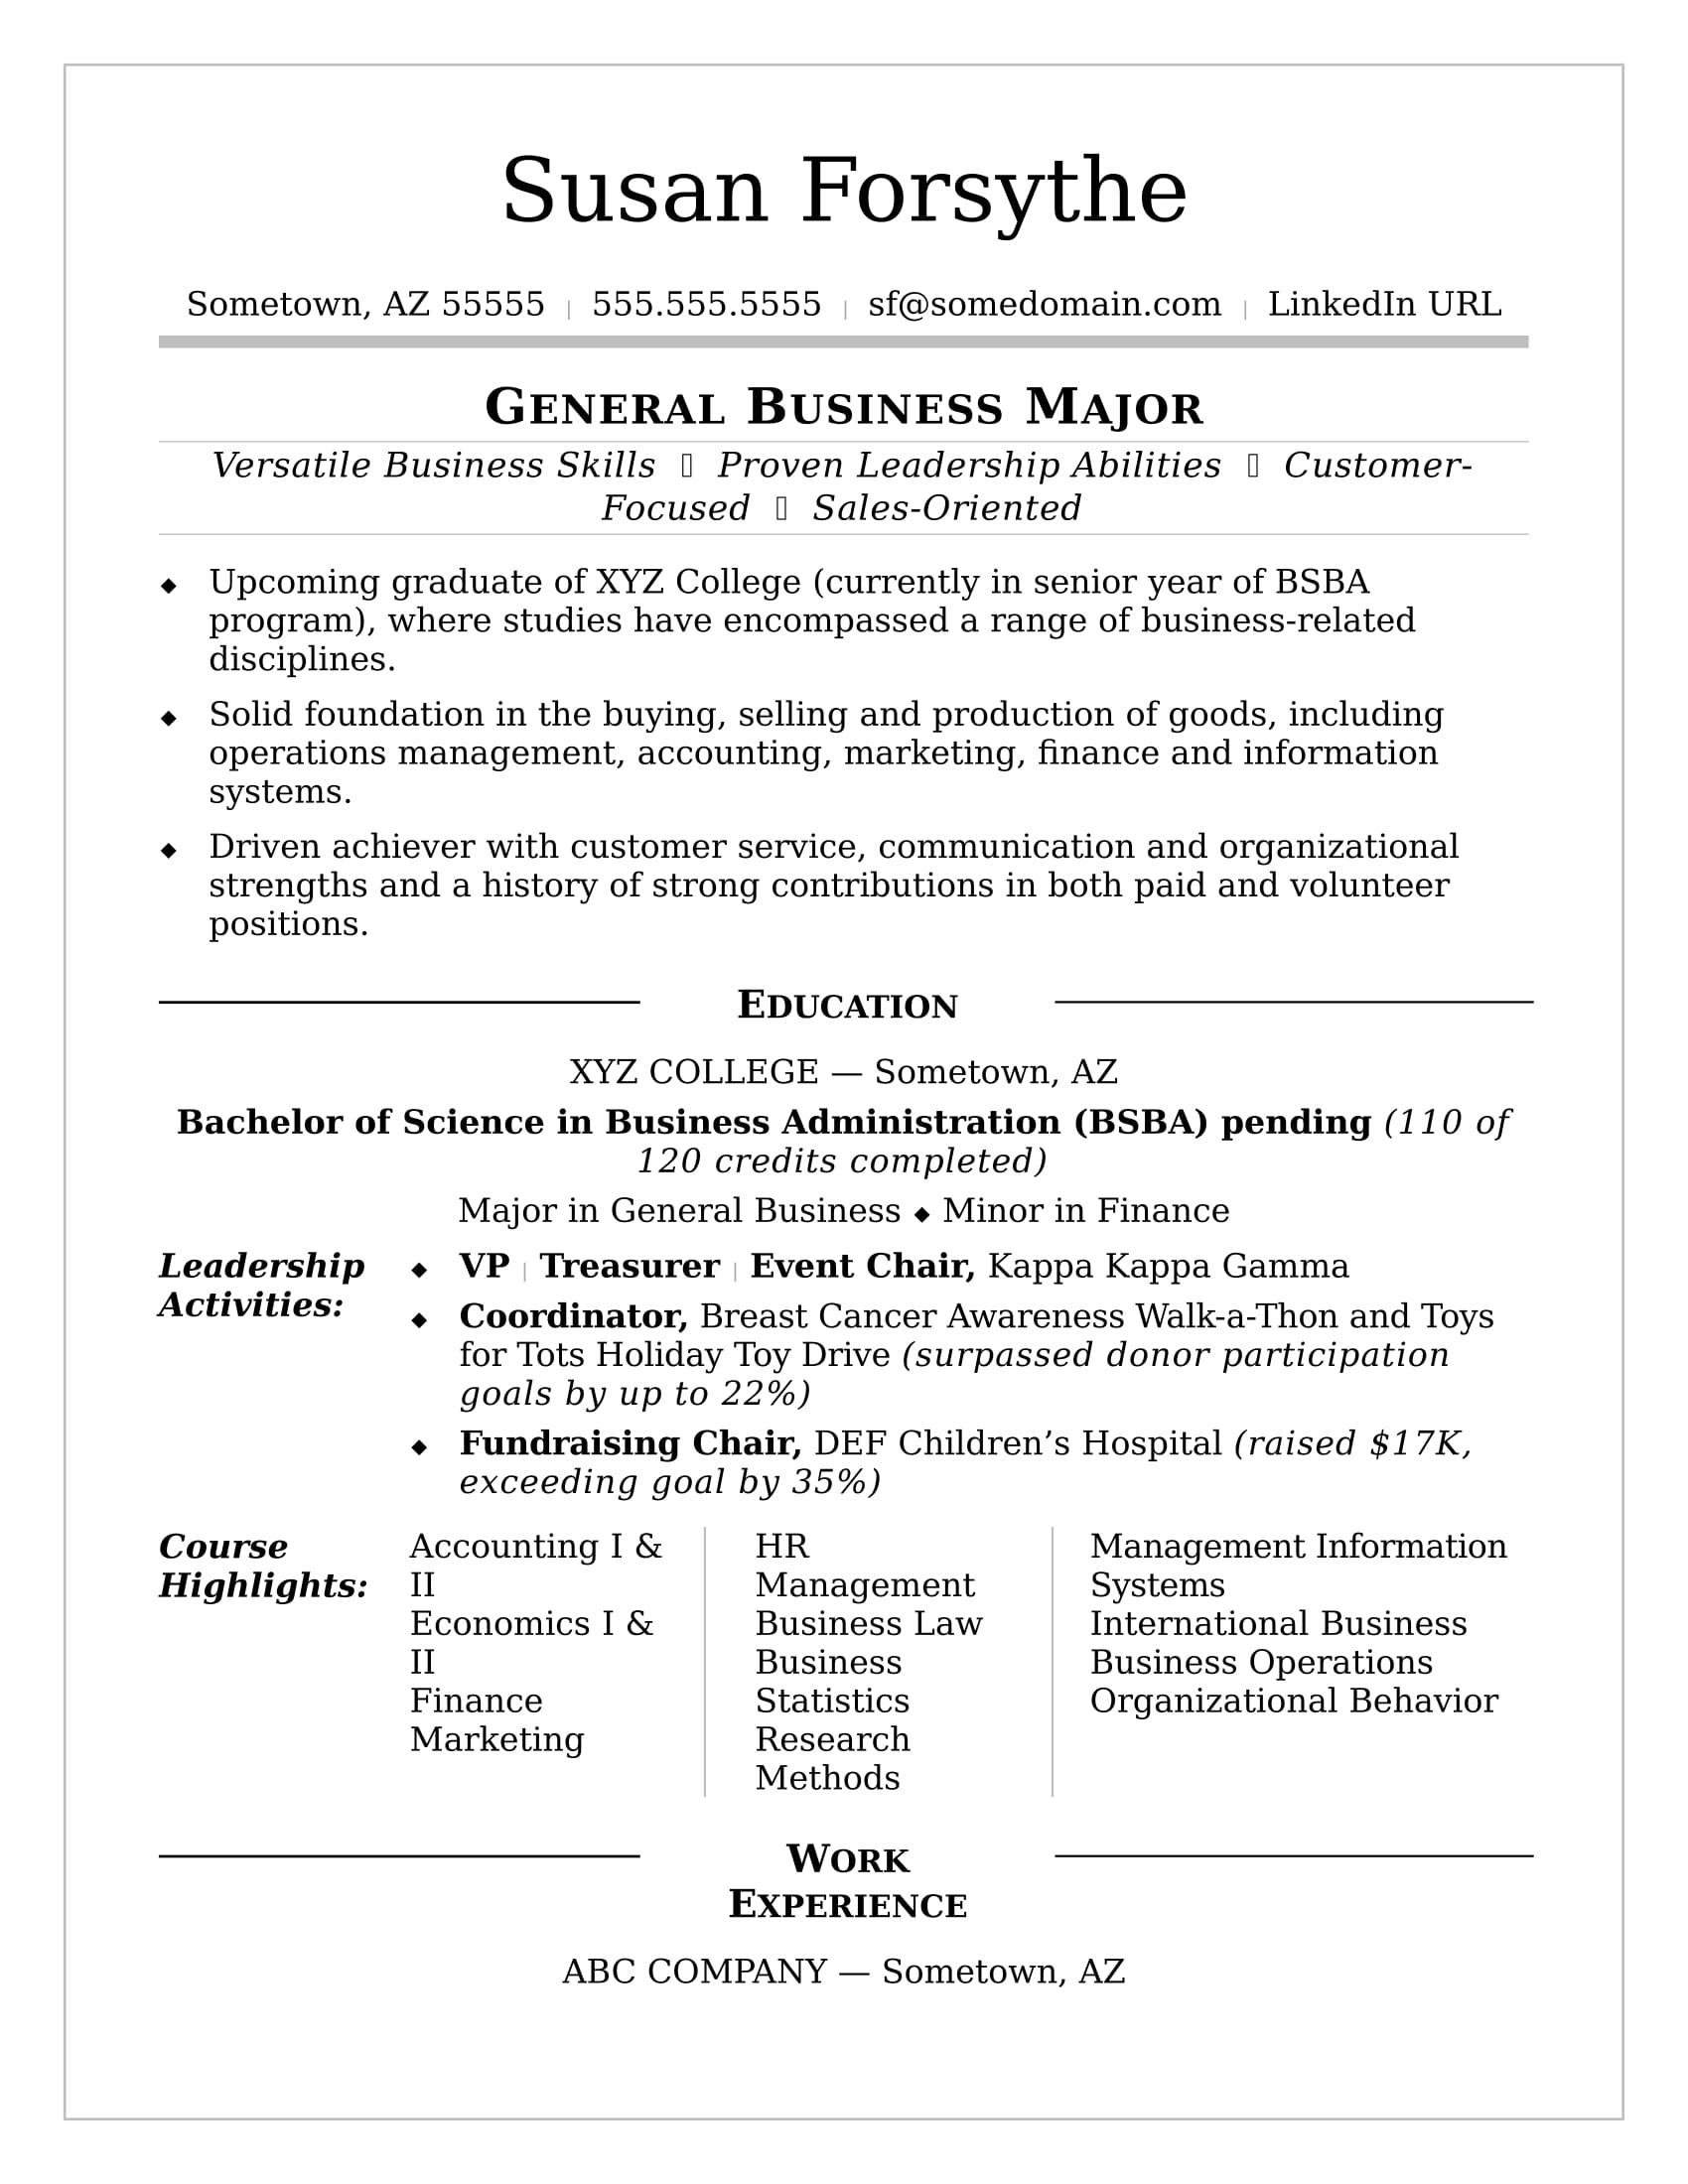 College Resume Sample | Monster.com